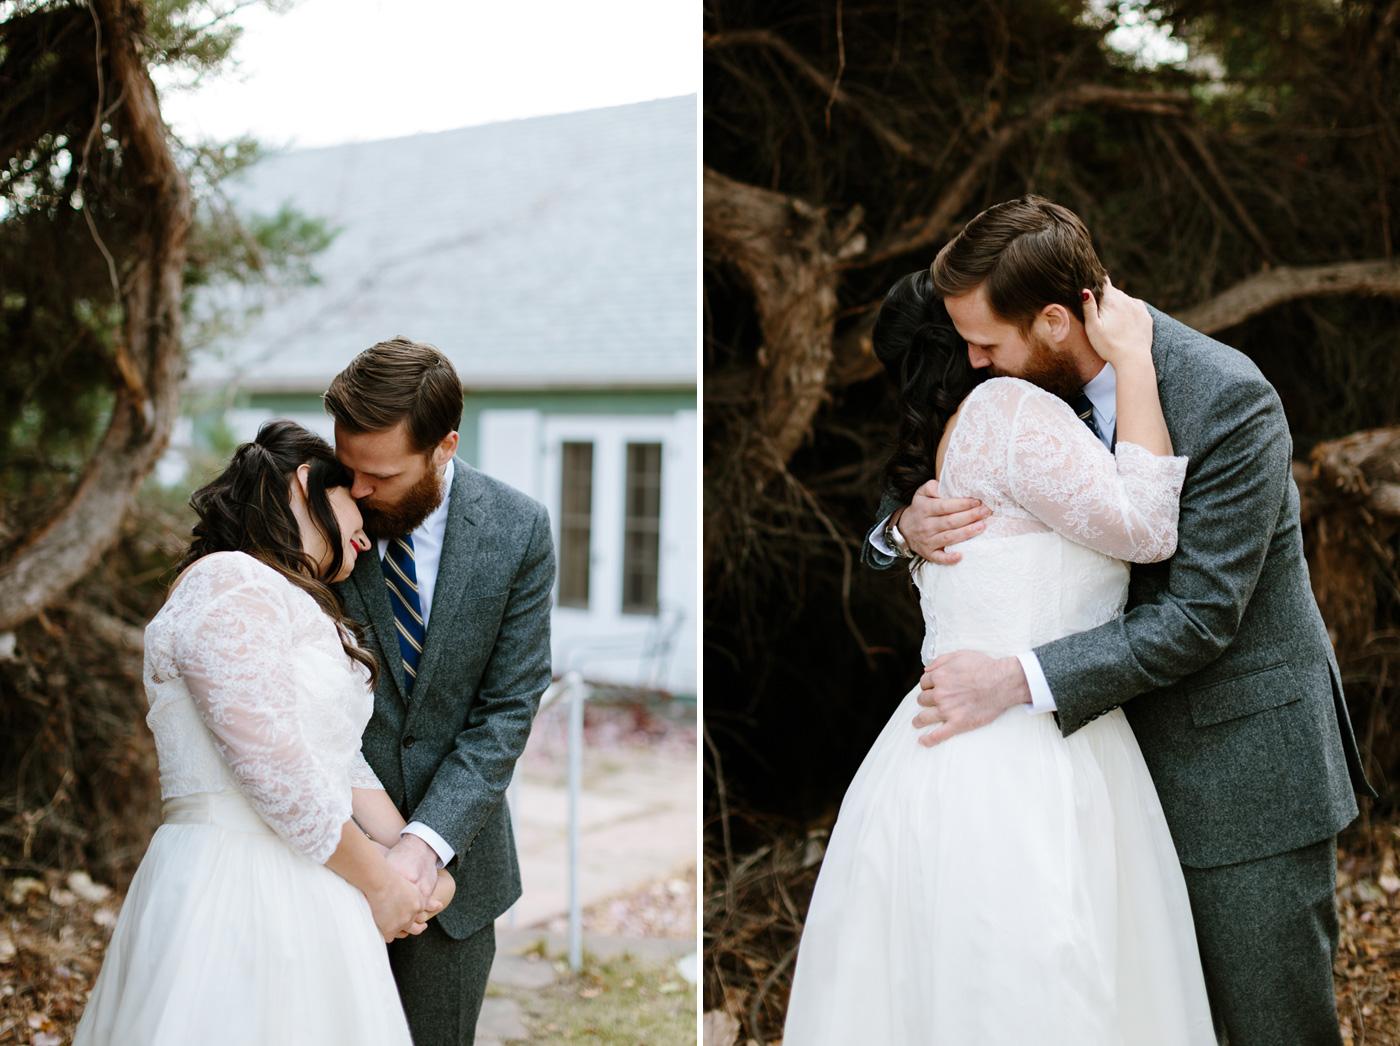 Studios at Overland Crossing Wedding Bride and Groom Embracing